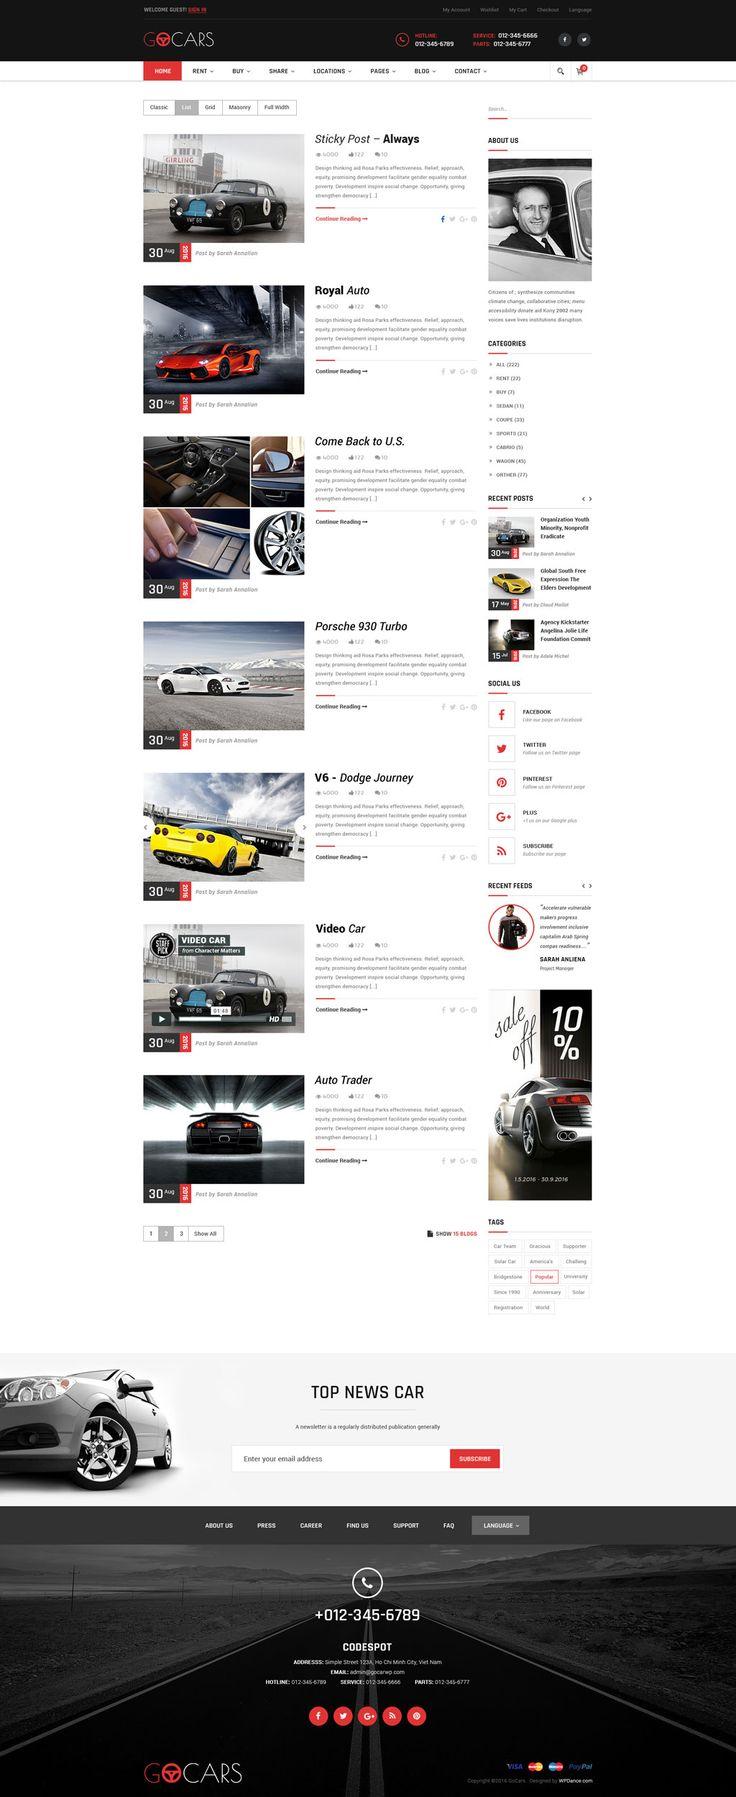 Go cars psd template design for car dealers market